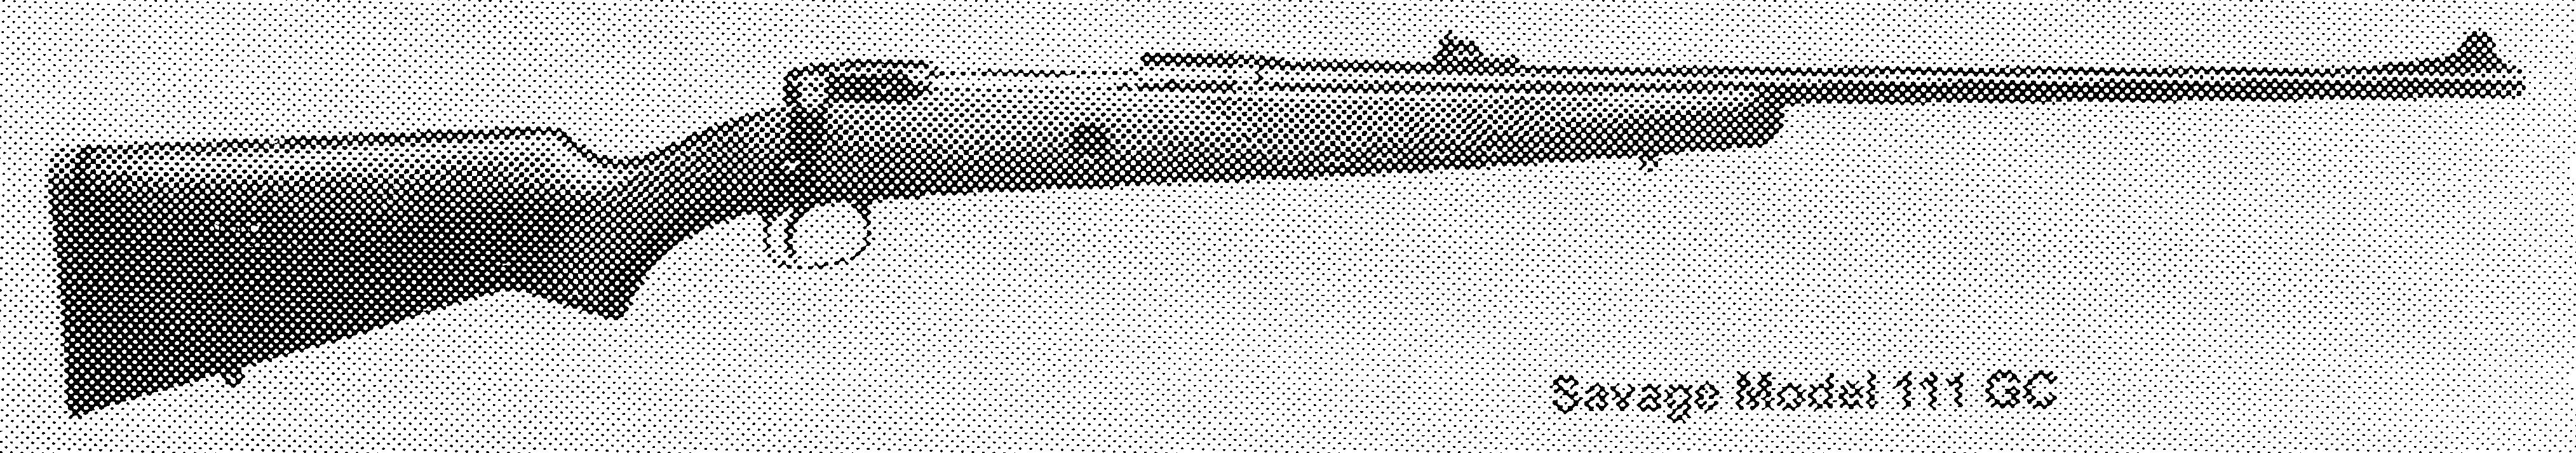 Model 111GC